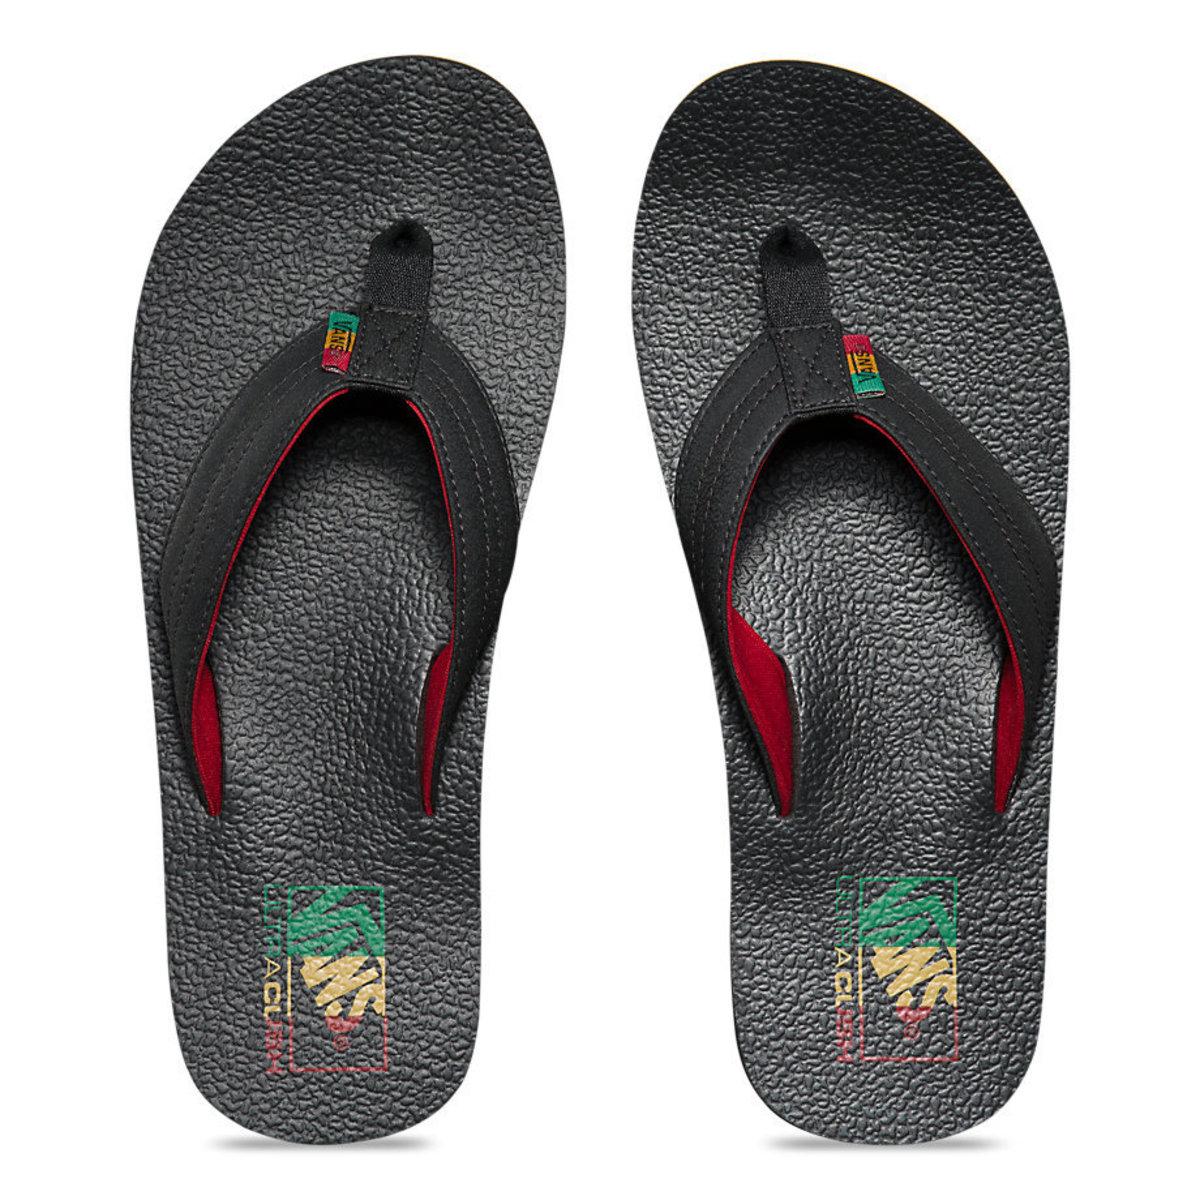 sandály pánské VANS - Nexpa Lite (Rasta) - Black/Chilli Pepper - V4MGIJ1